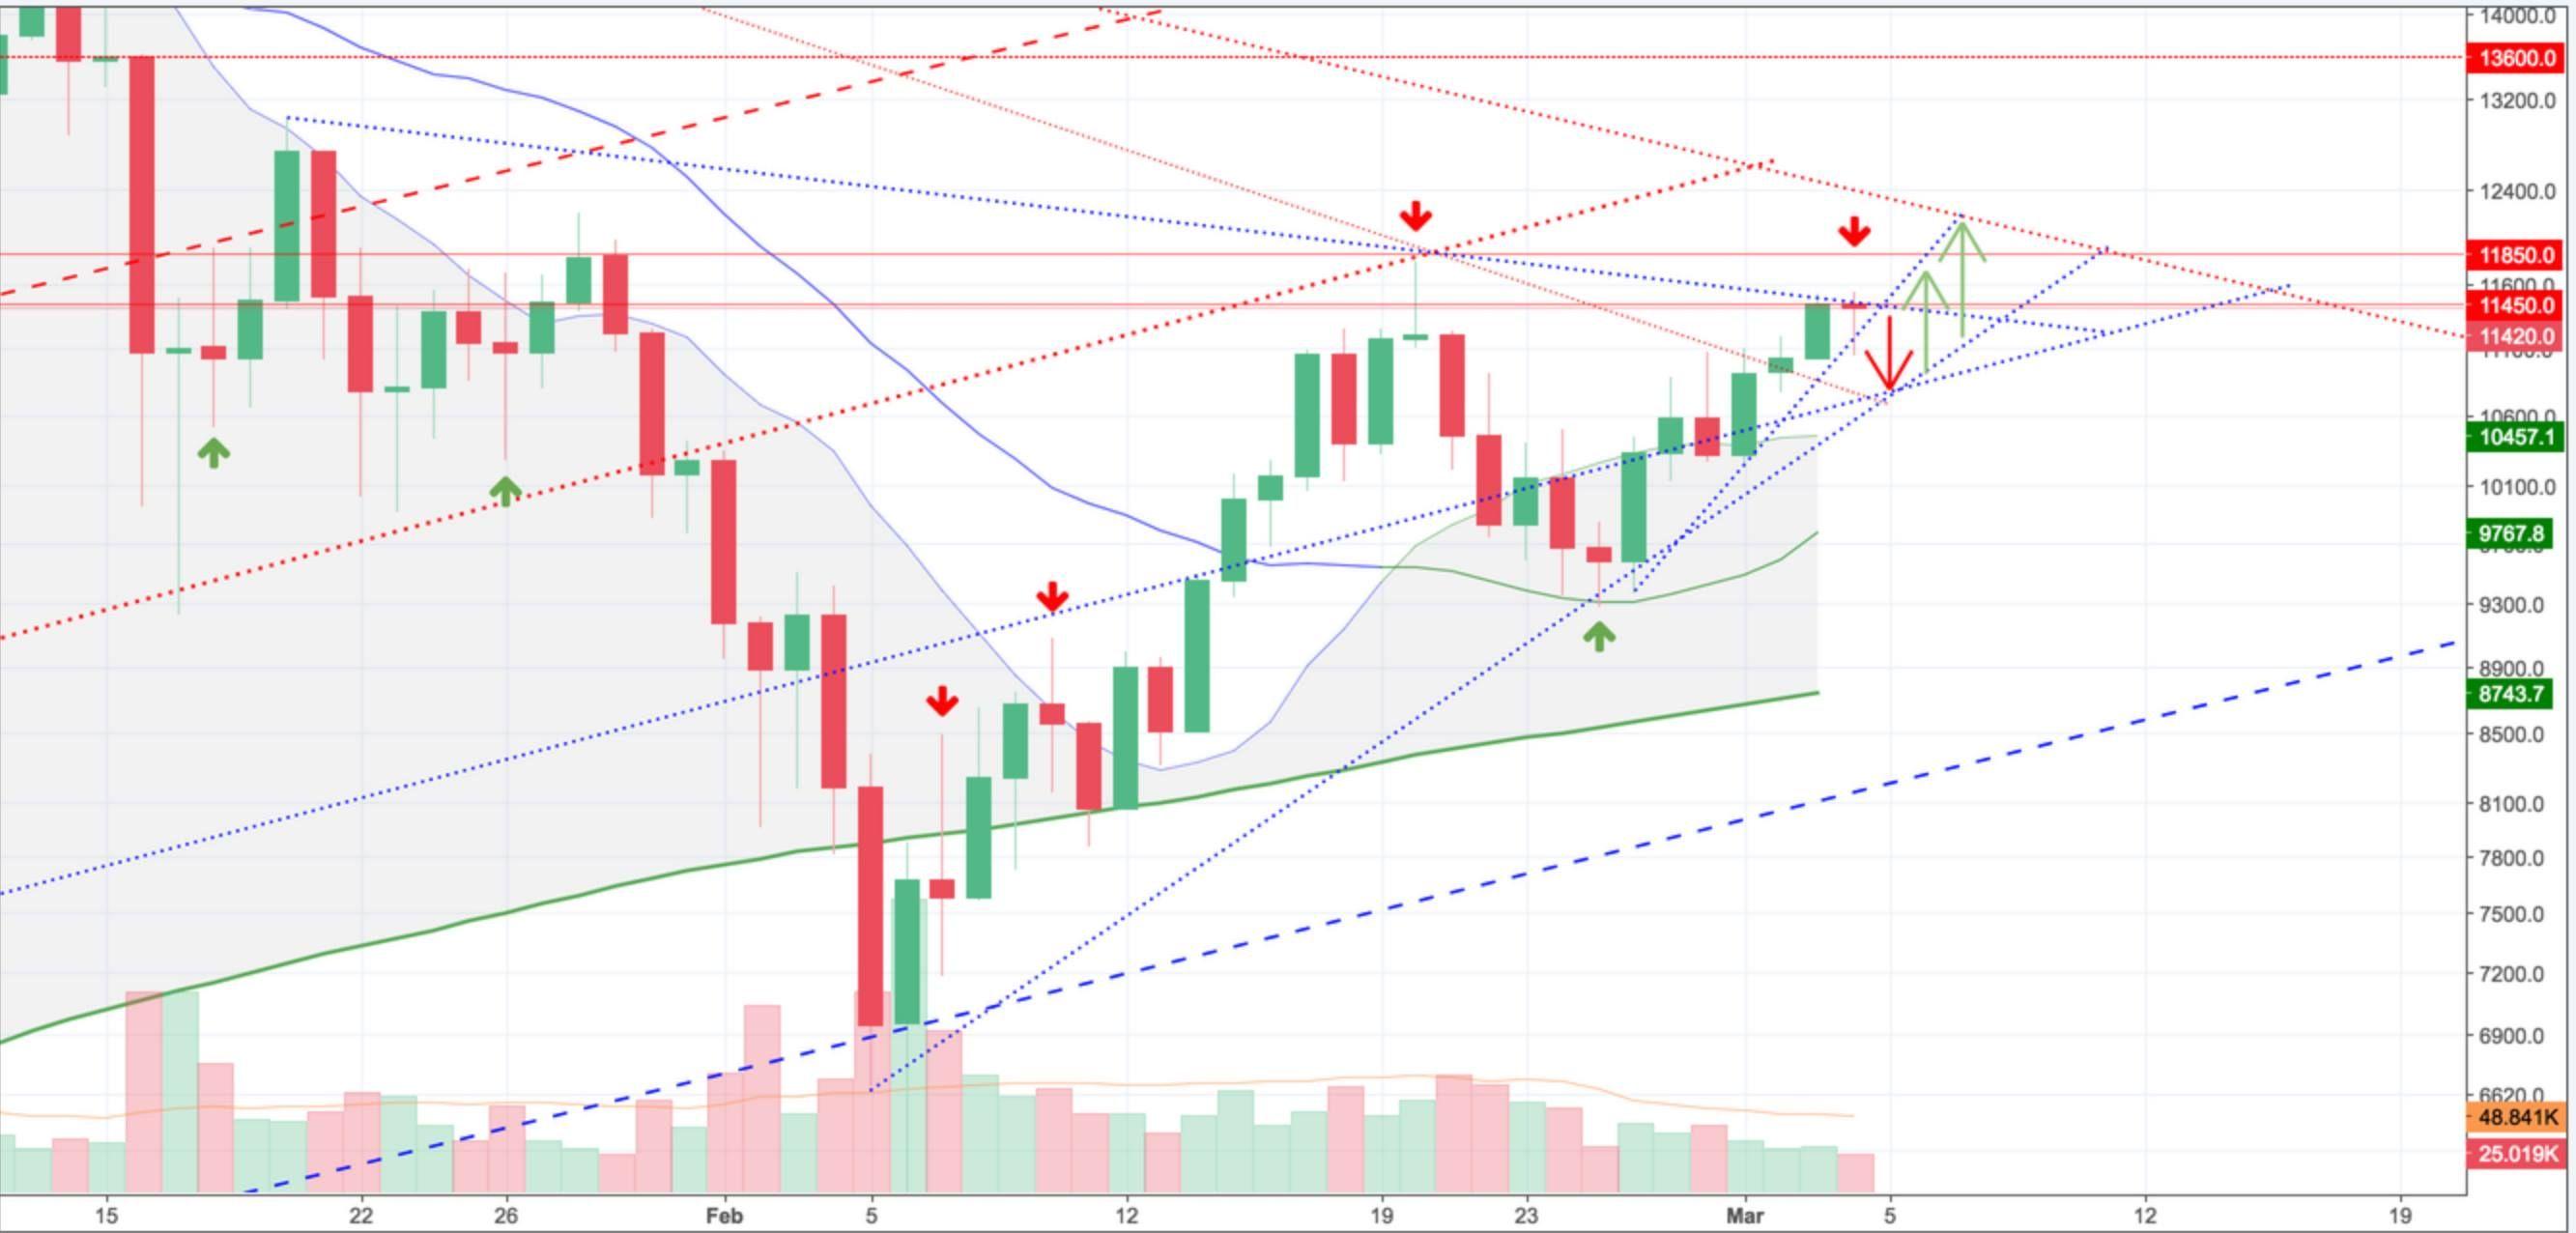 Bitcoin Btc Usd Live Price And Market Cap